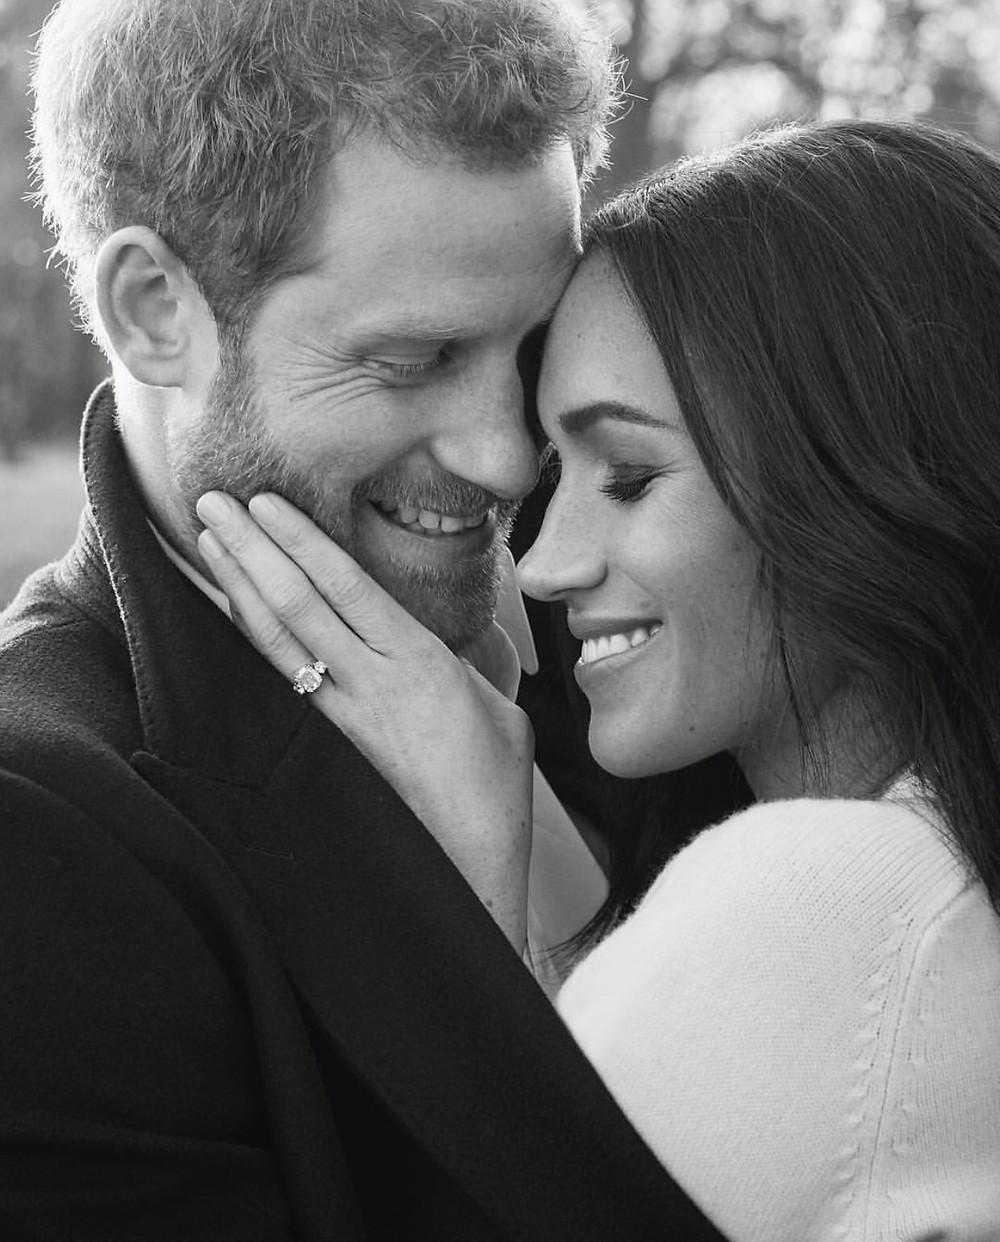 Alex Lubomirski - Megan & Harry Engagement